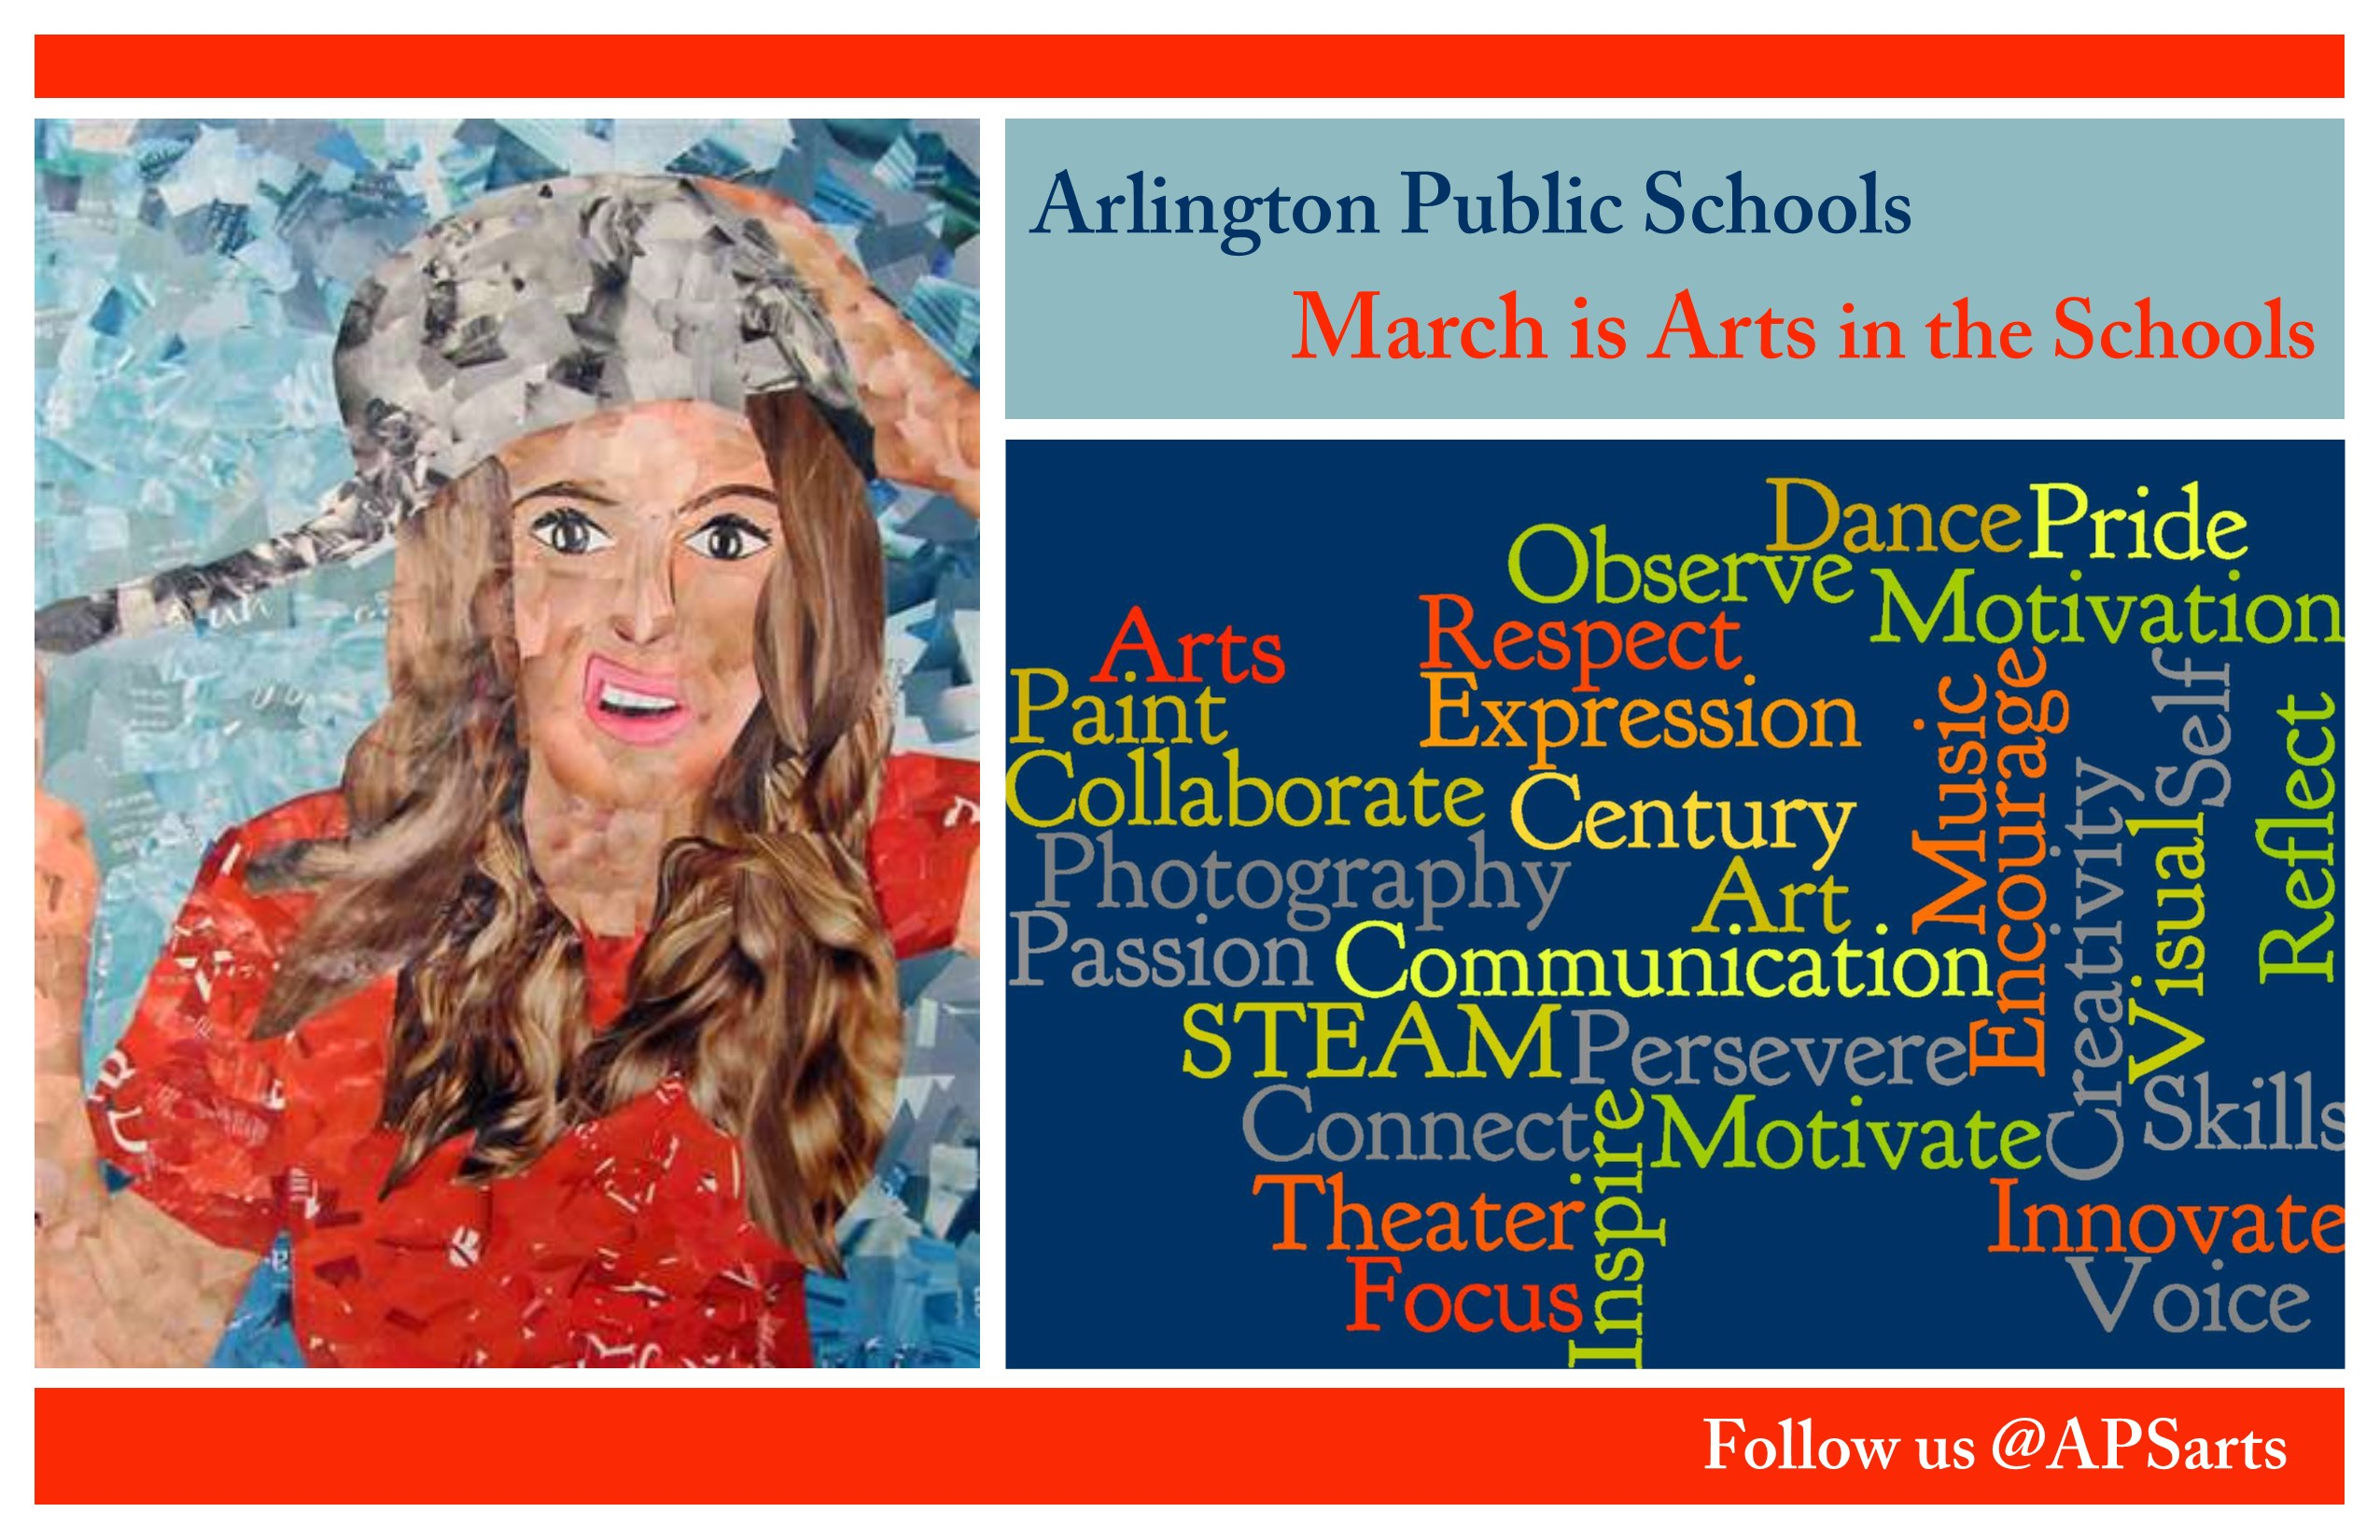 APS Celebrates Arts in the Schools Month